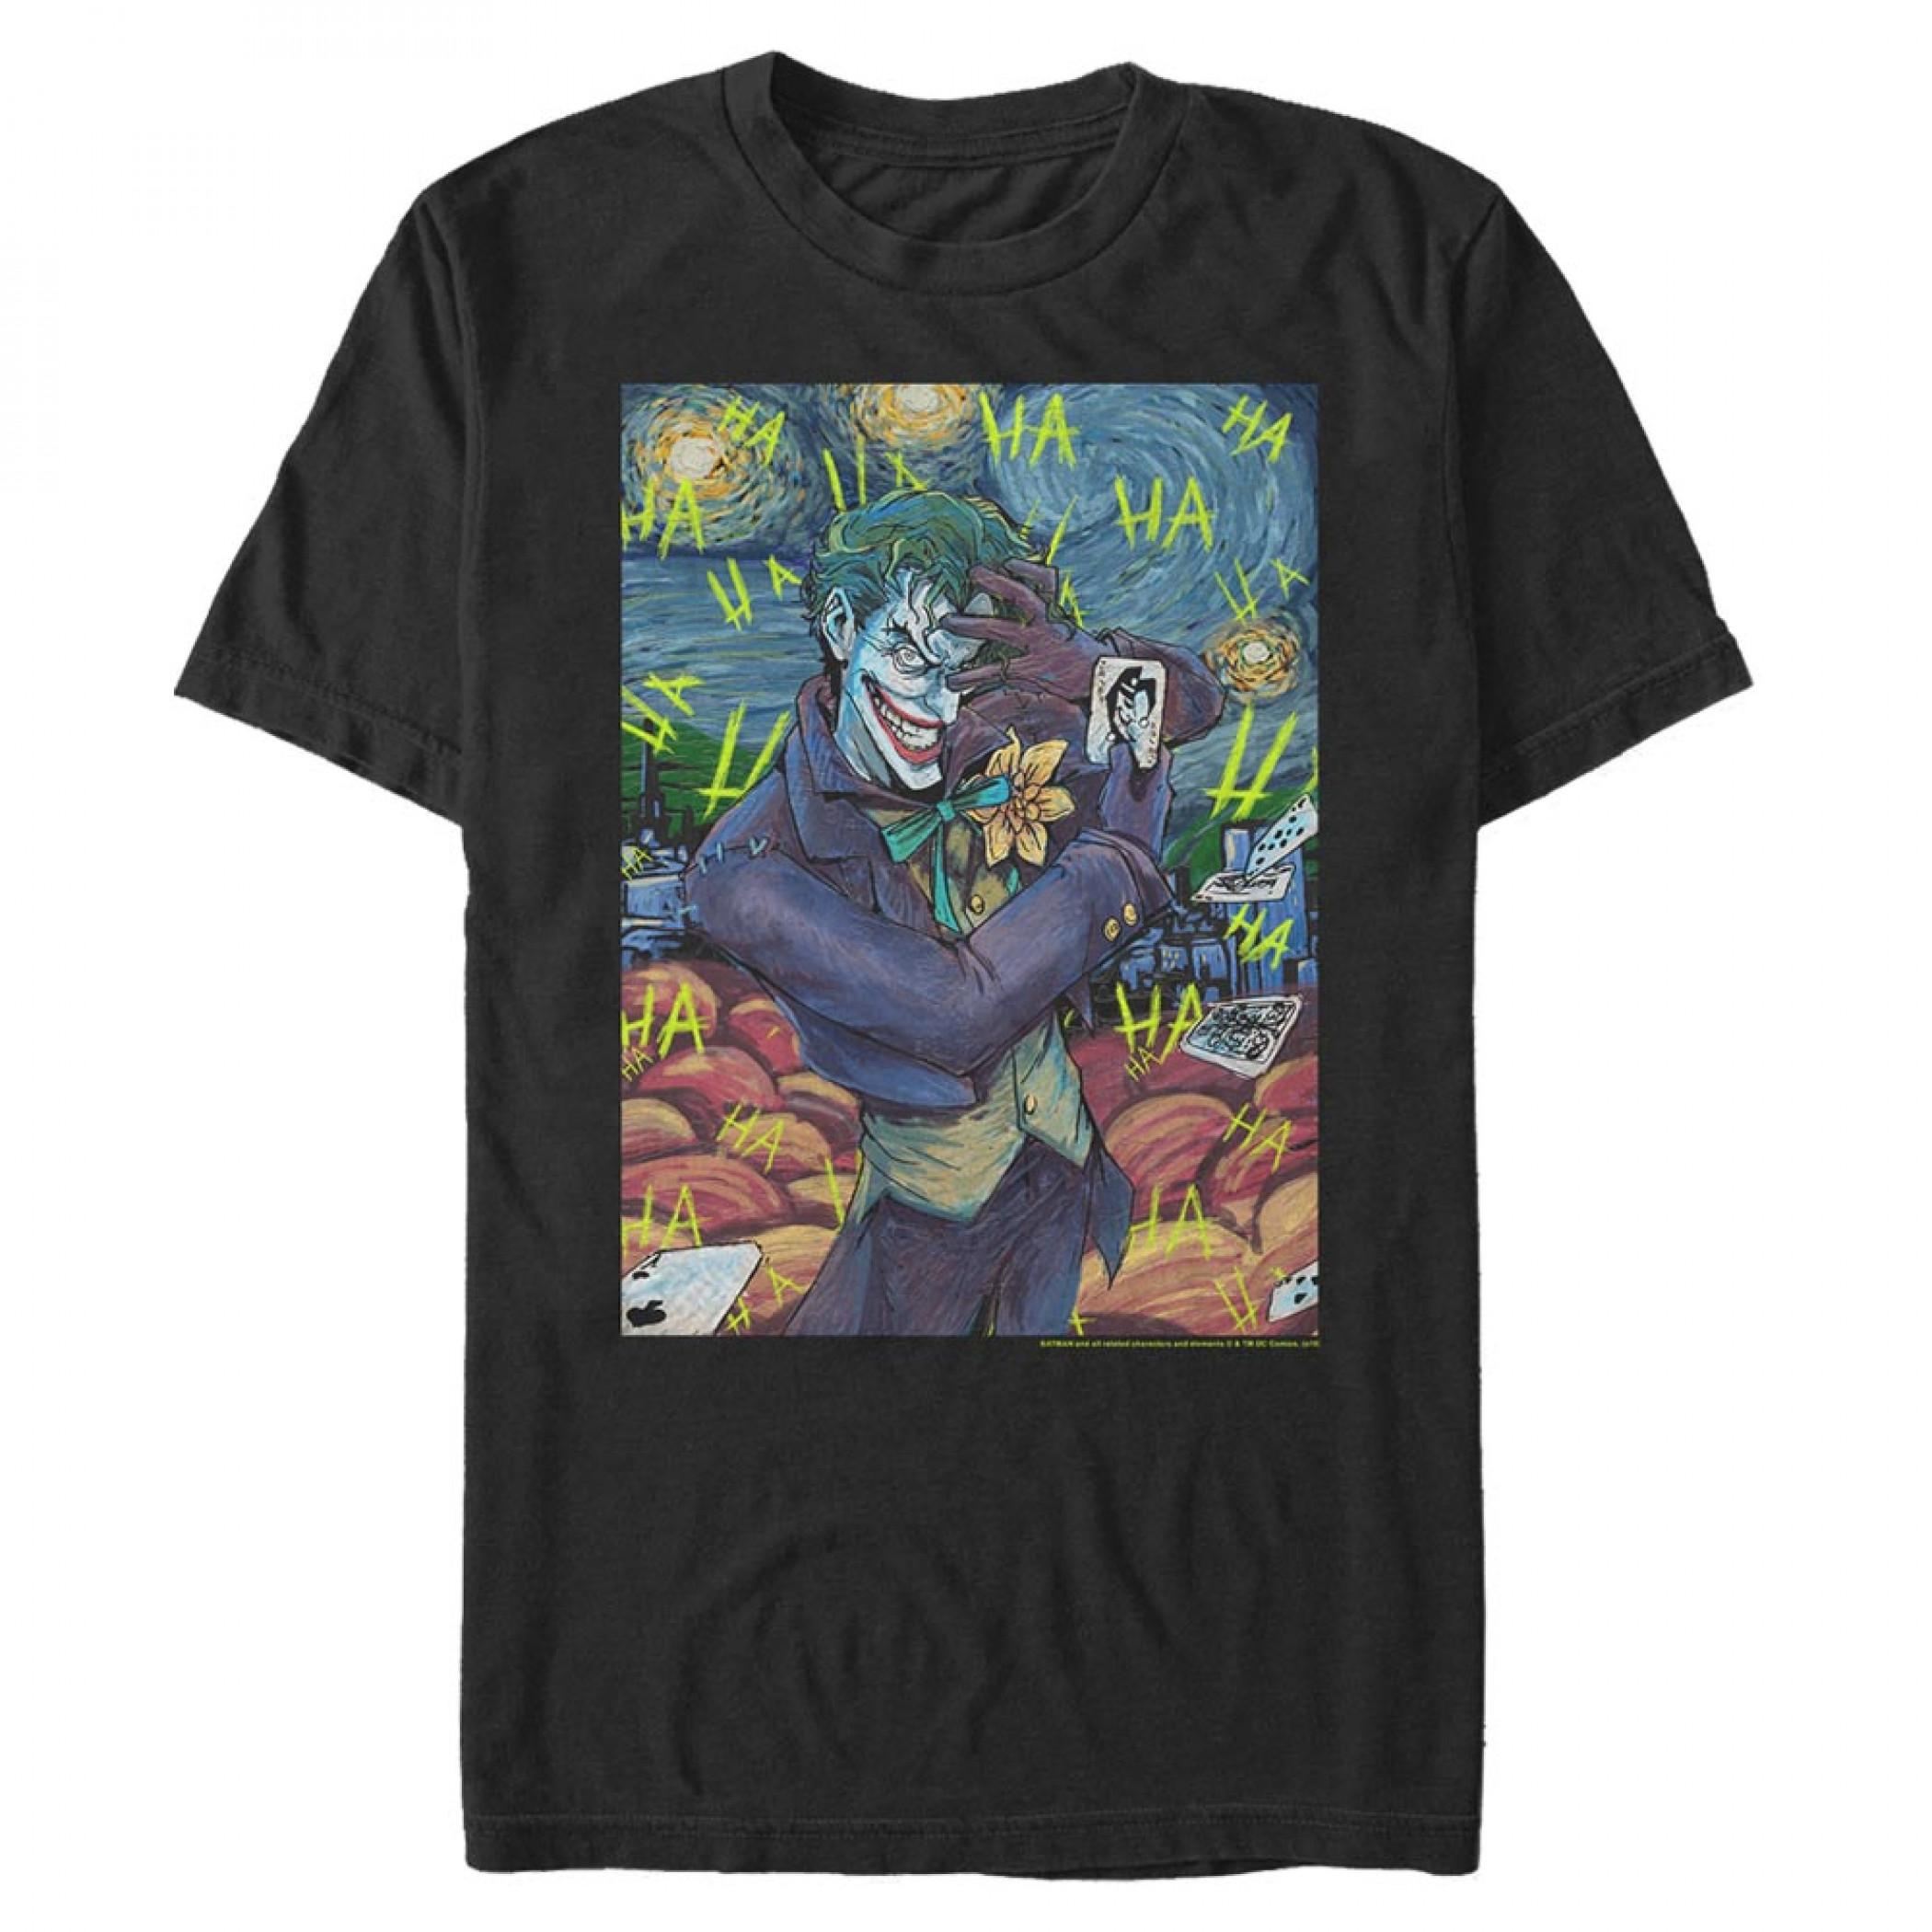 The Joker Van Gogh Painting T-Shirt